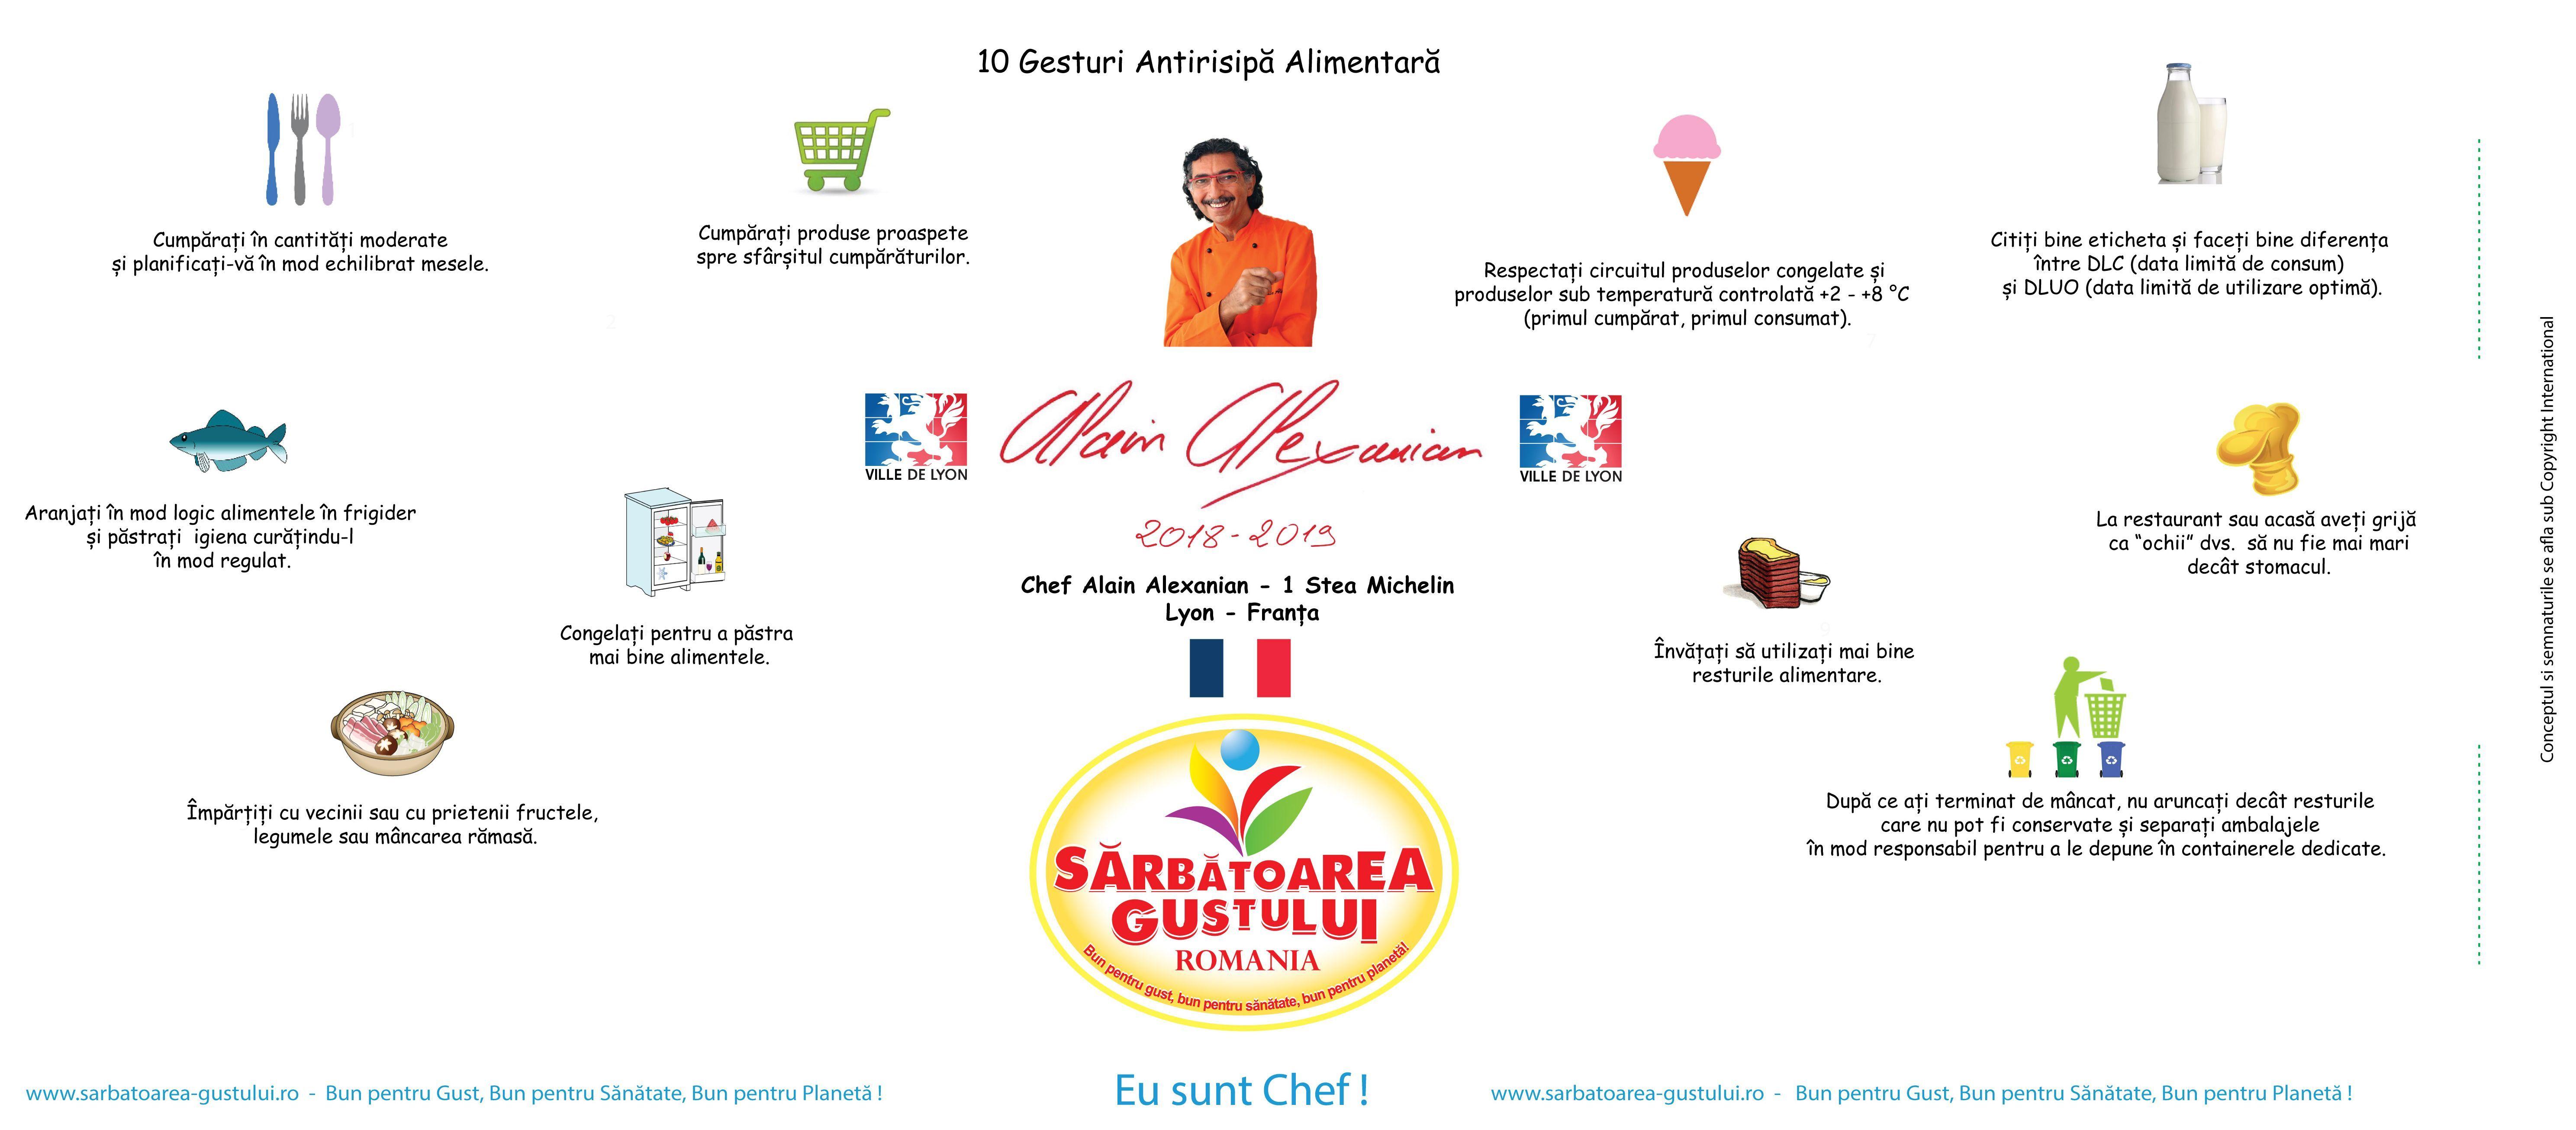 Boneta Bucatar - Sarbatoarea Gustului - 2019